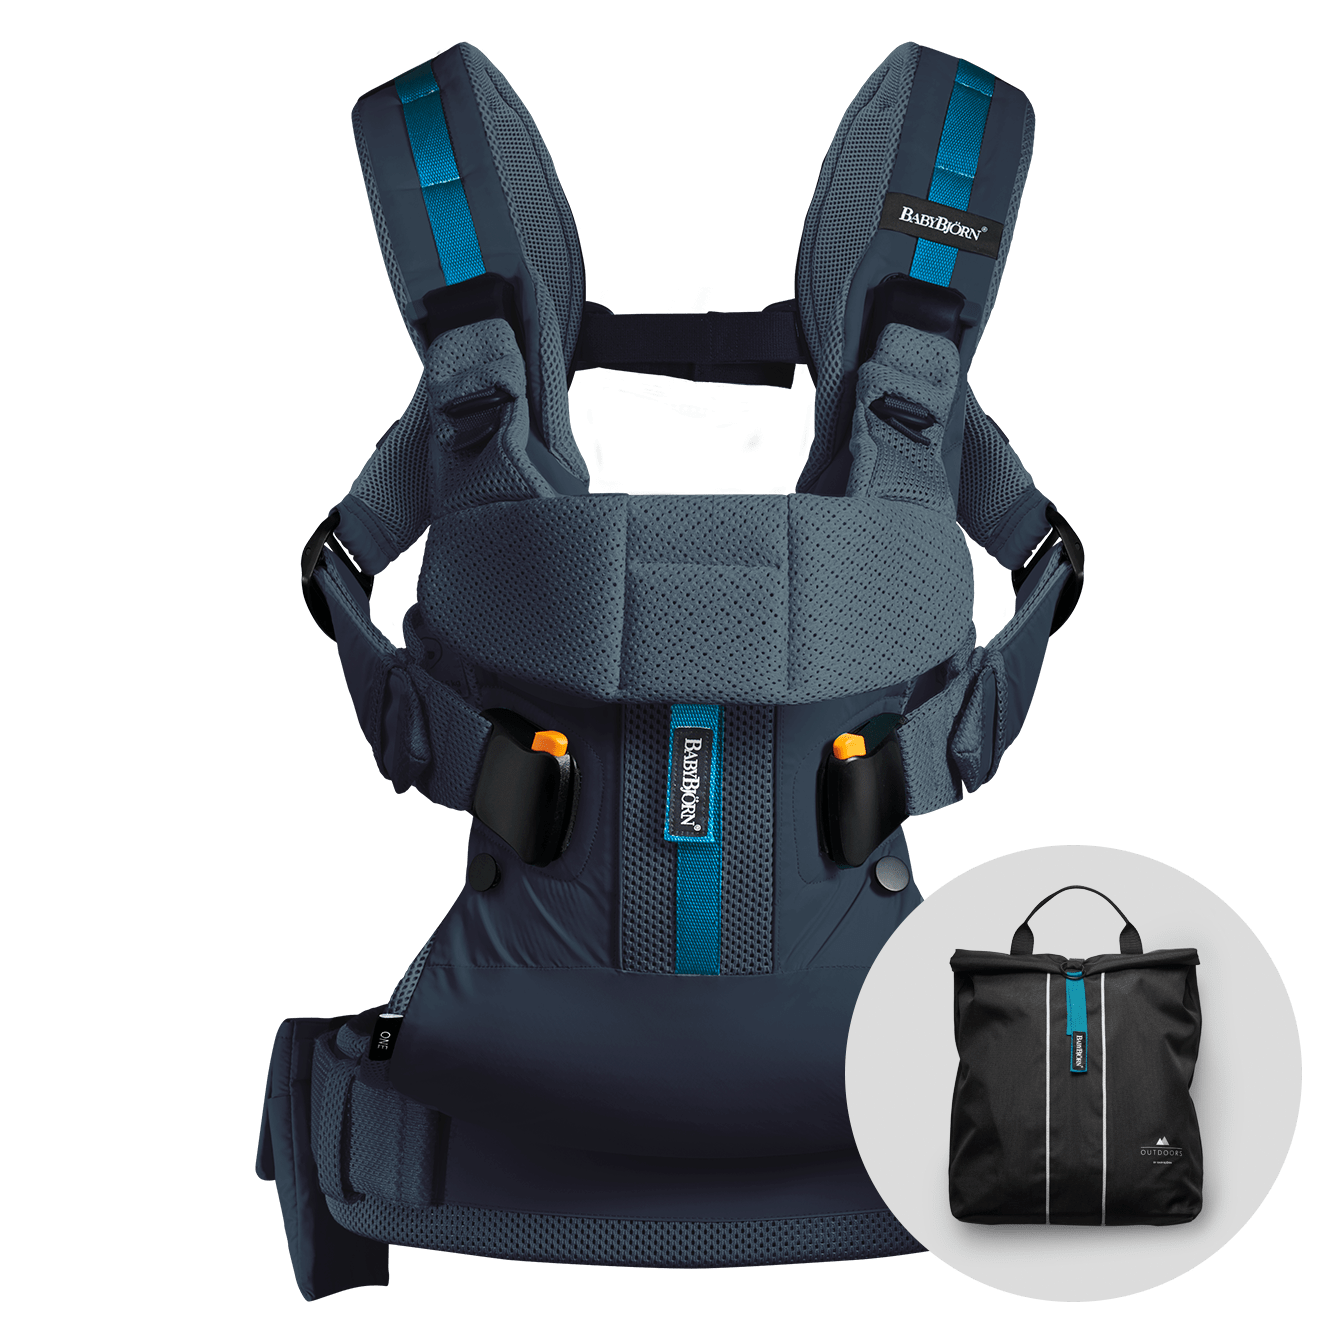 porte-bebe-one-outdoors-bleu-fonce-094062-sticker-babybjorn